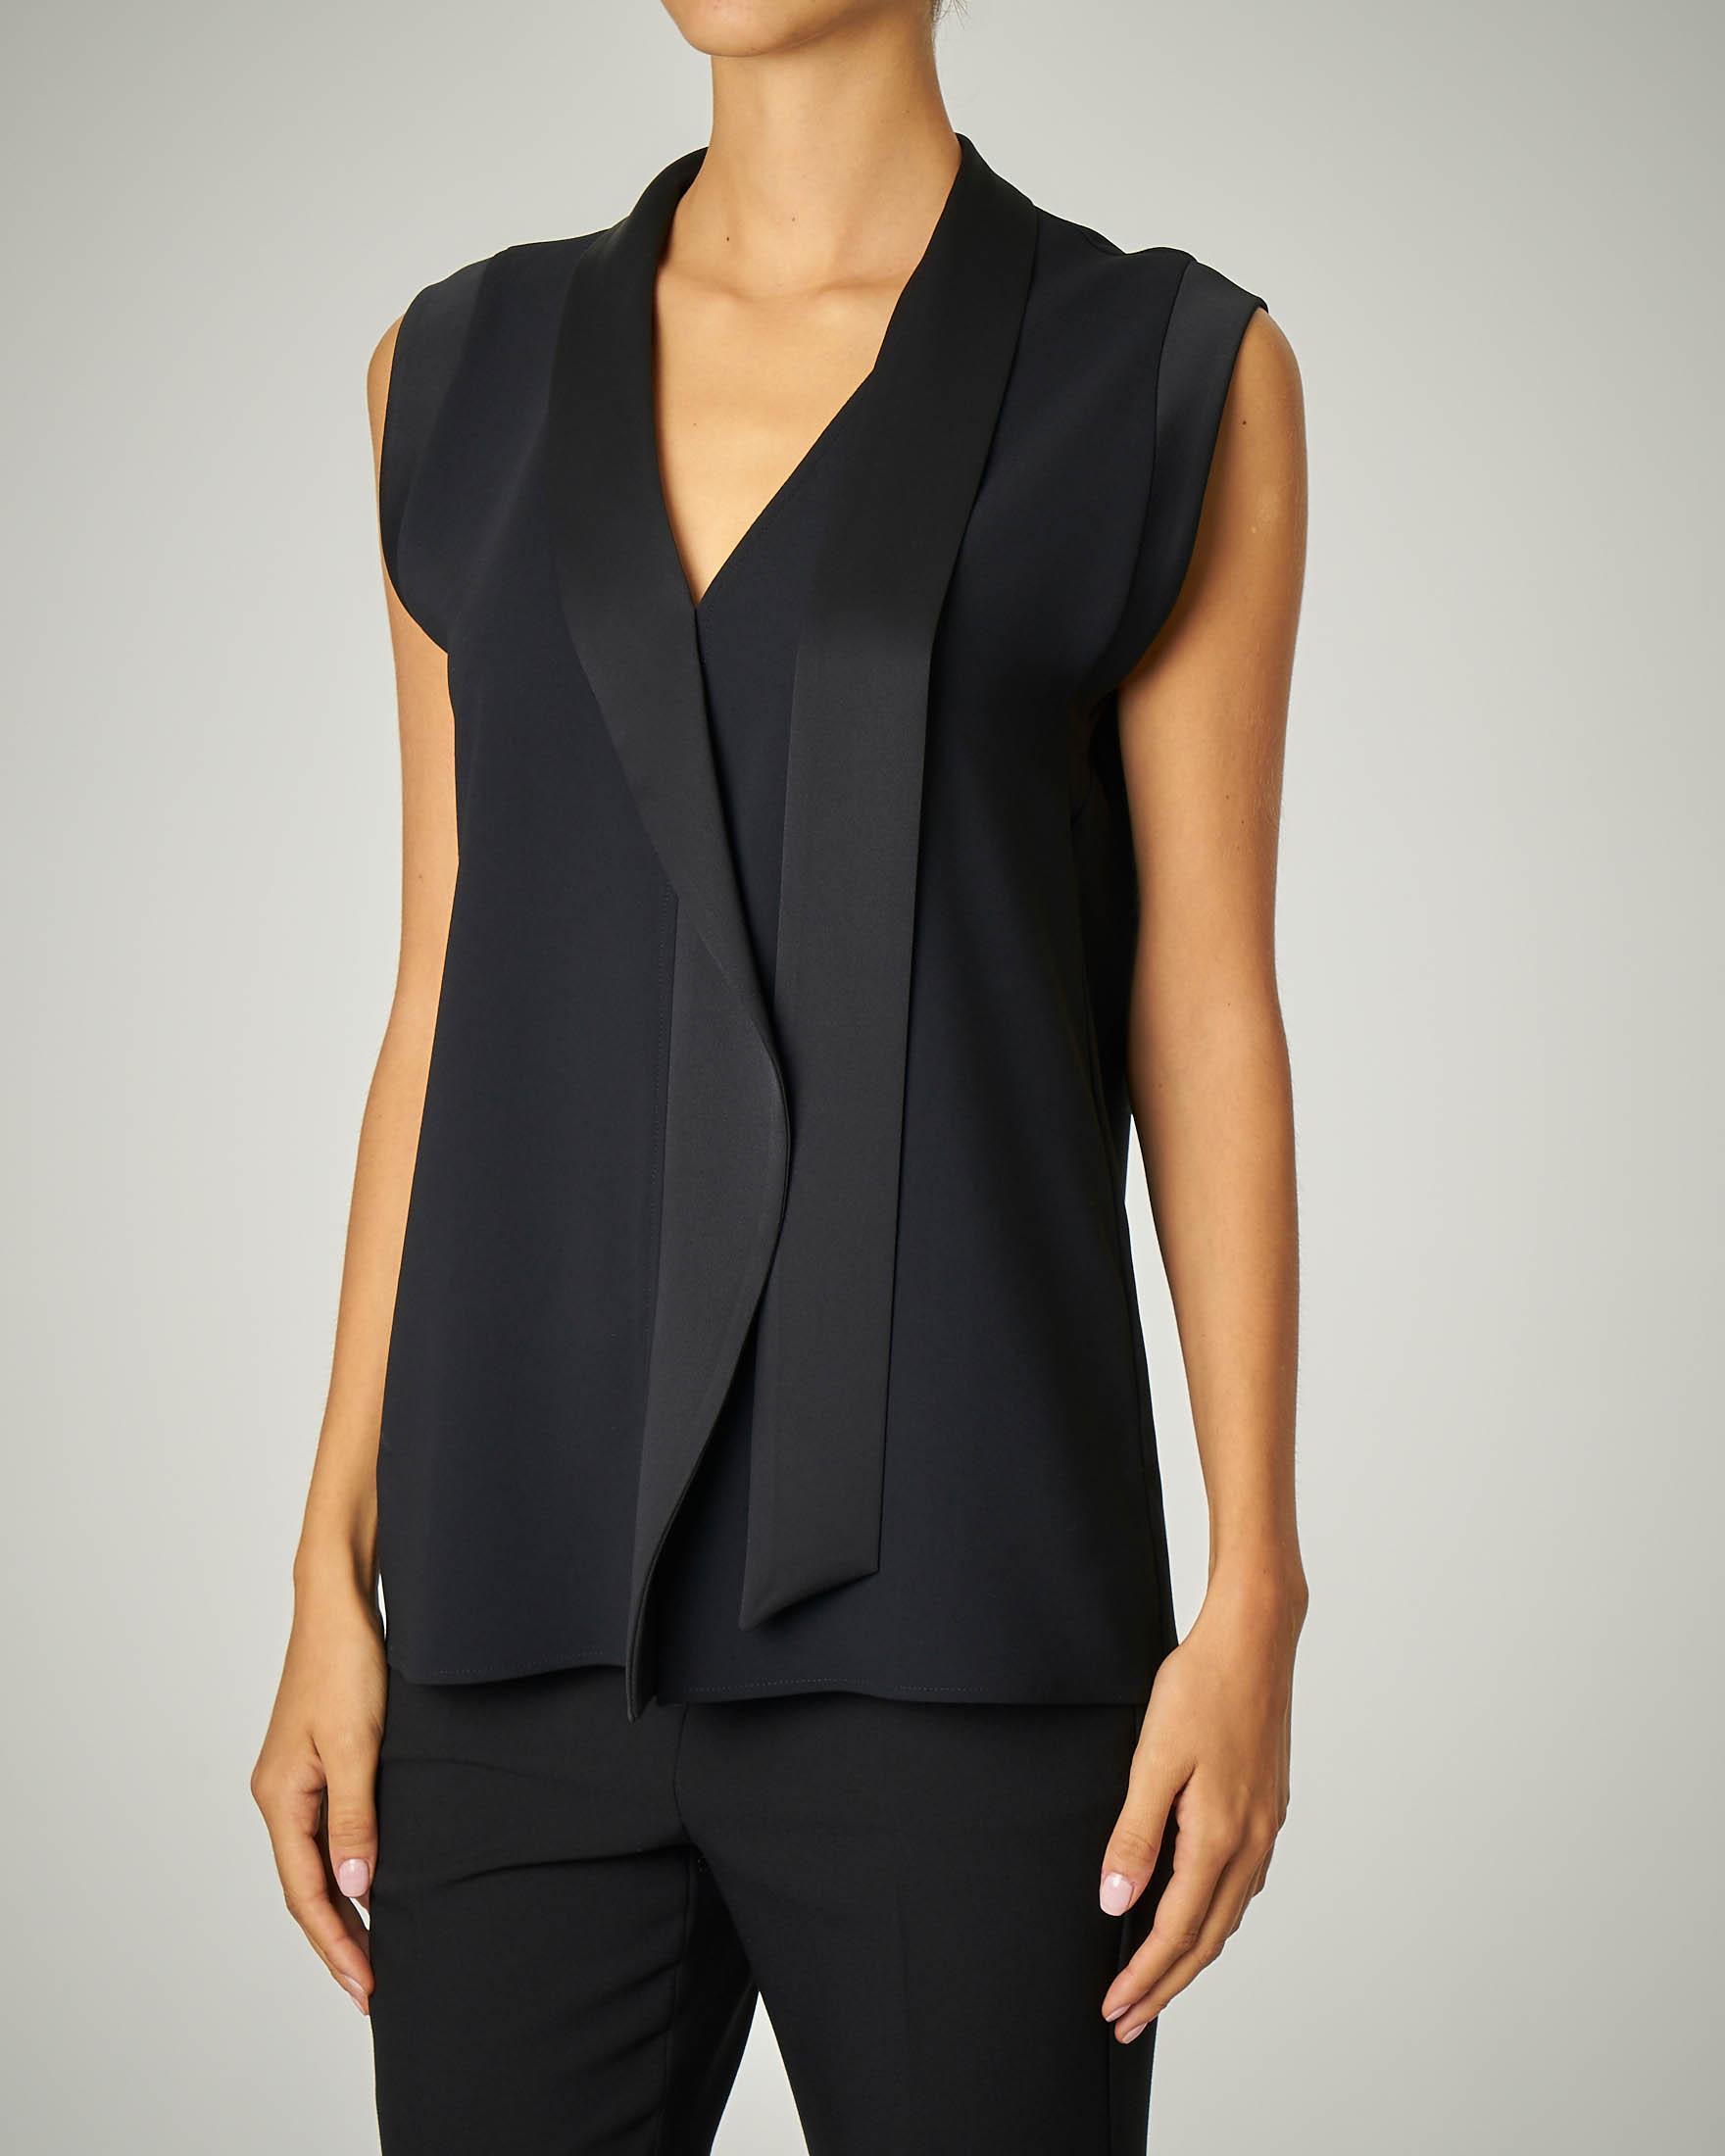 Camicia nera senza maniche